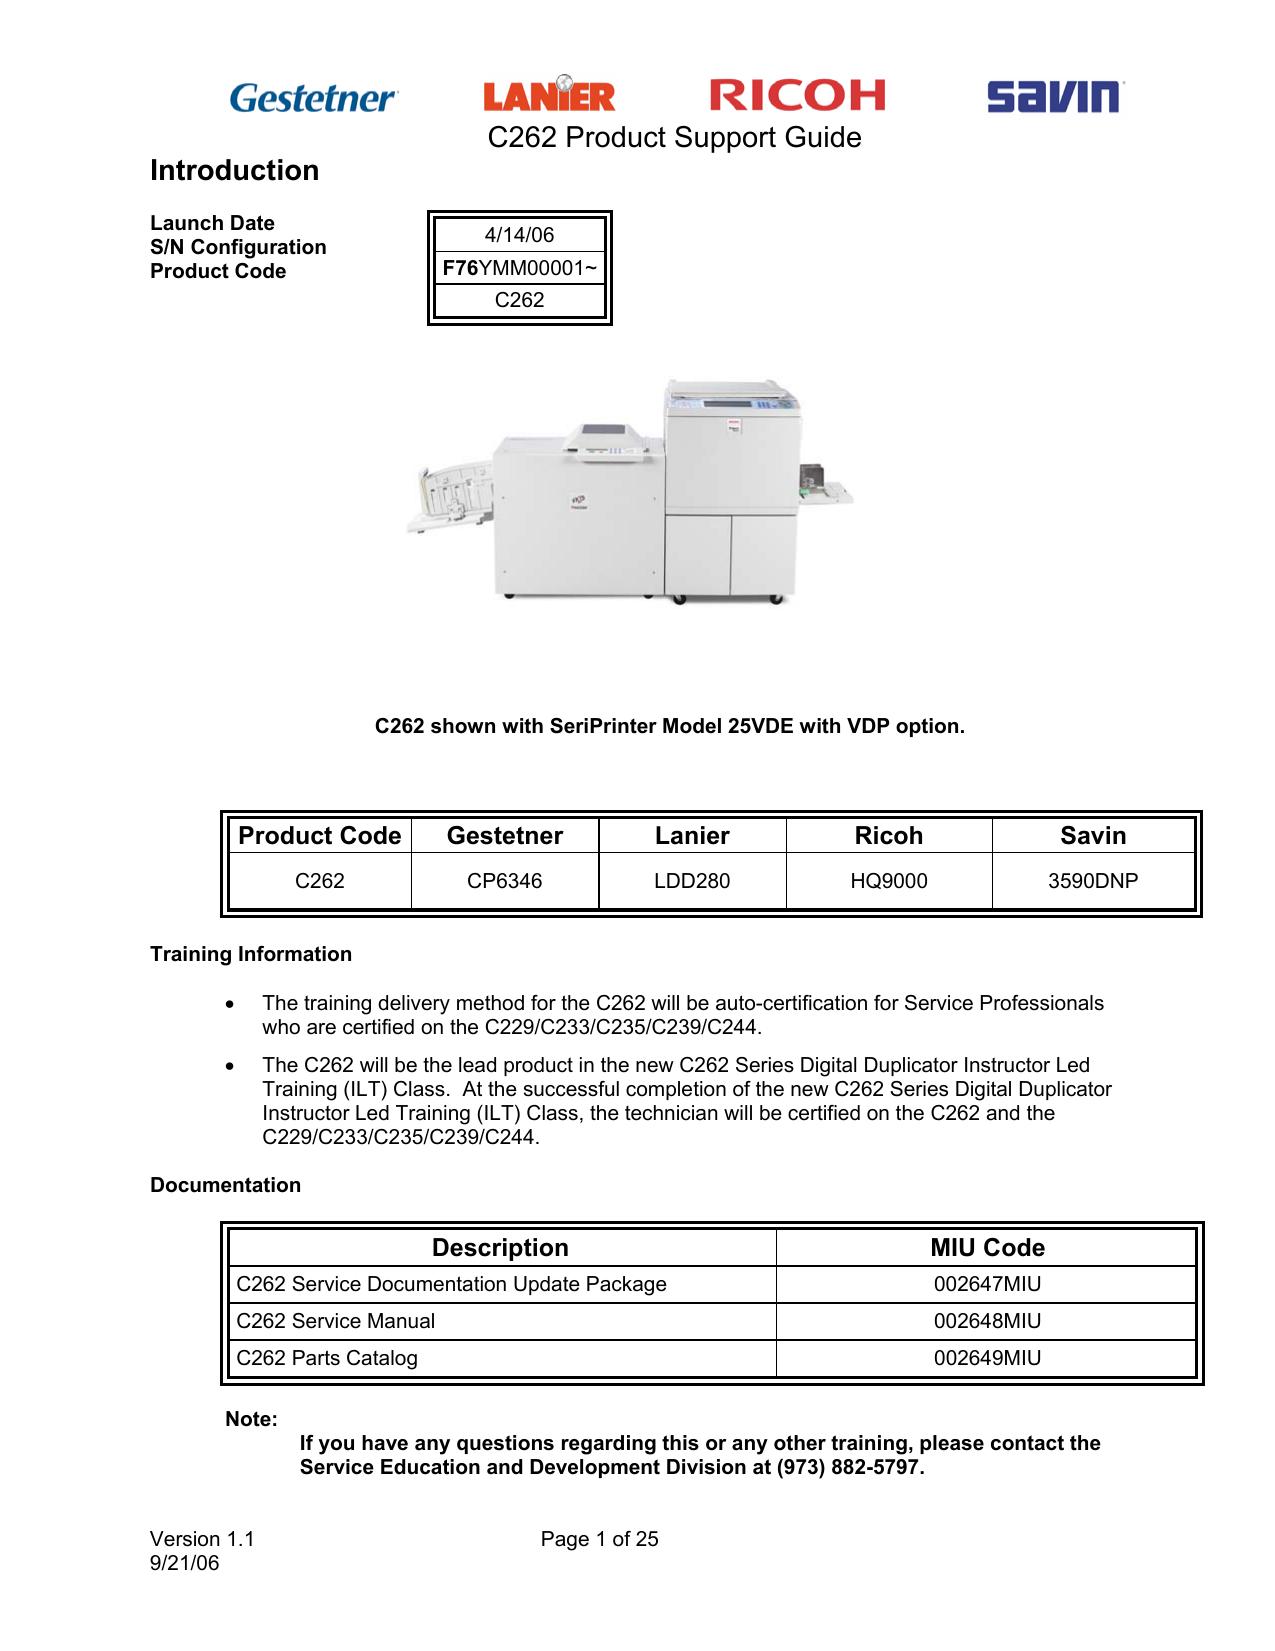 DRIVER FOR RICOH PRIPORT HQ9000 DIGITAL DUPLICATOR POSTSCRIPT3